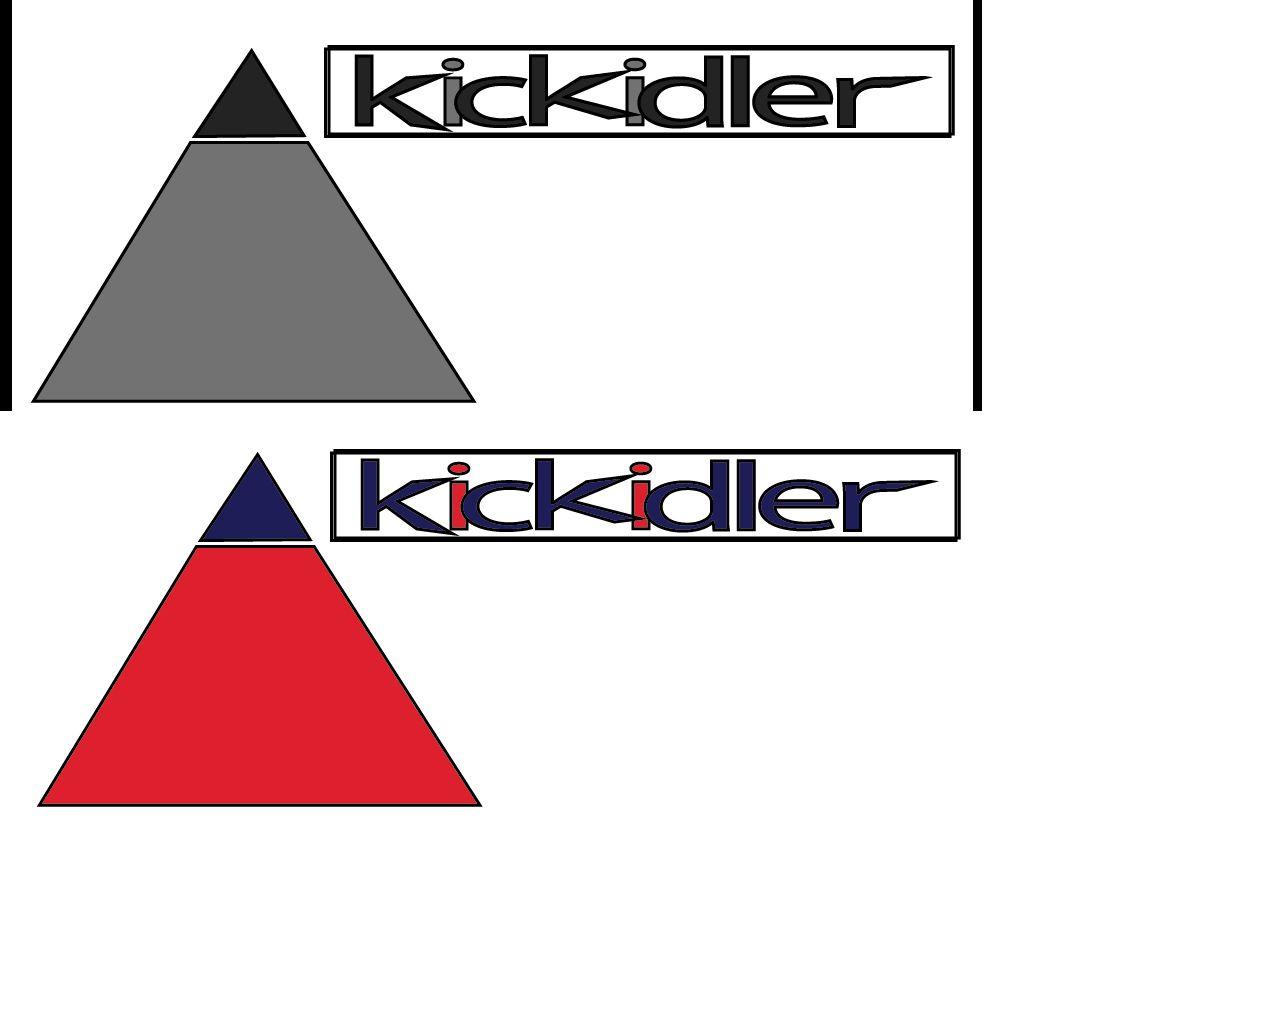 Логотип для клиента РА Маньяко - дизайнер GVV